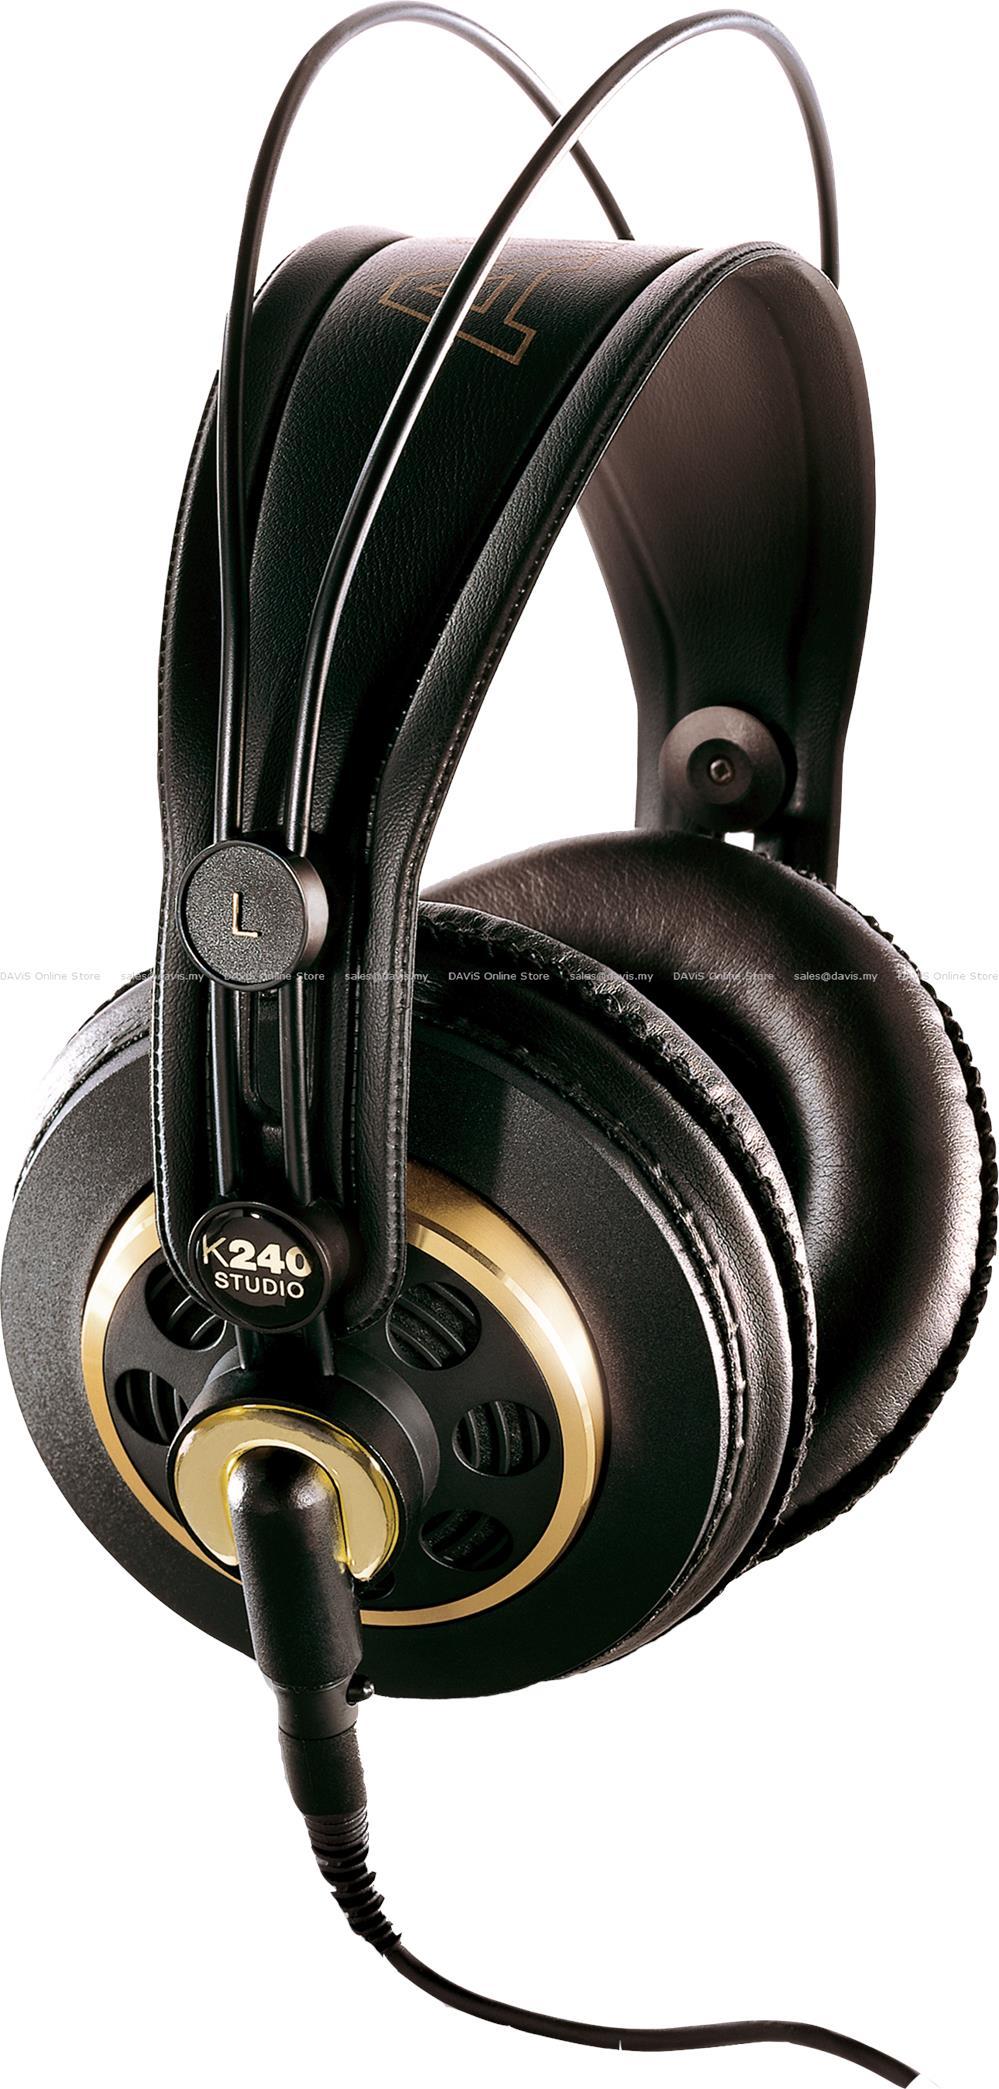 AKG Pro K240 Studio Mixing / Mastering ^ Headphones ^ Free Shipping